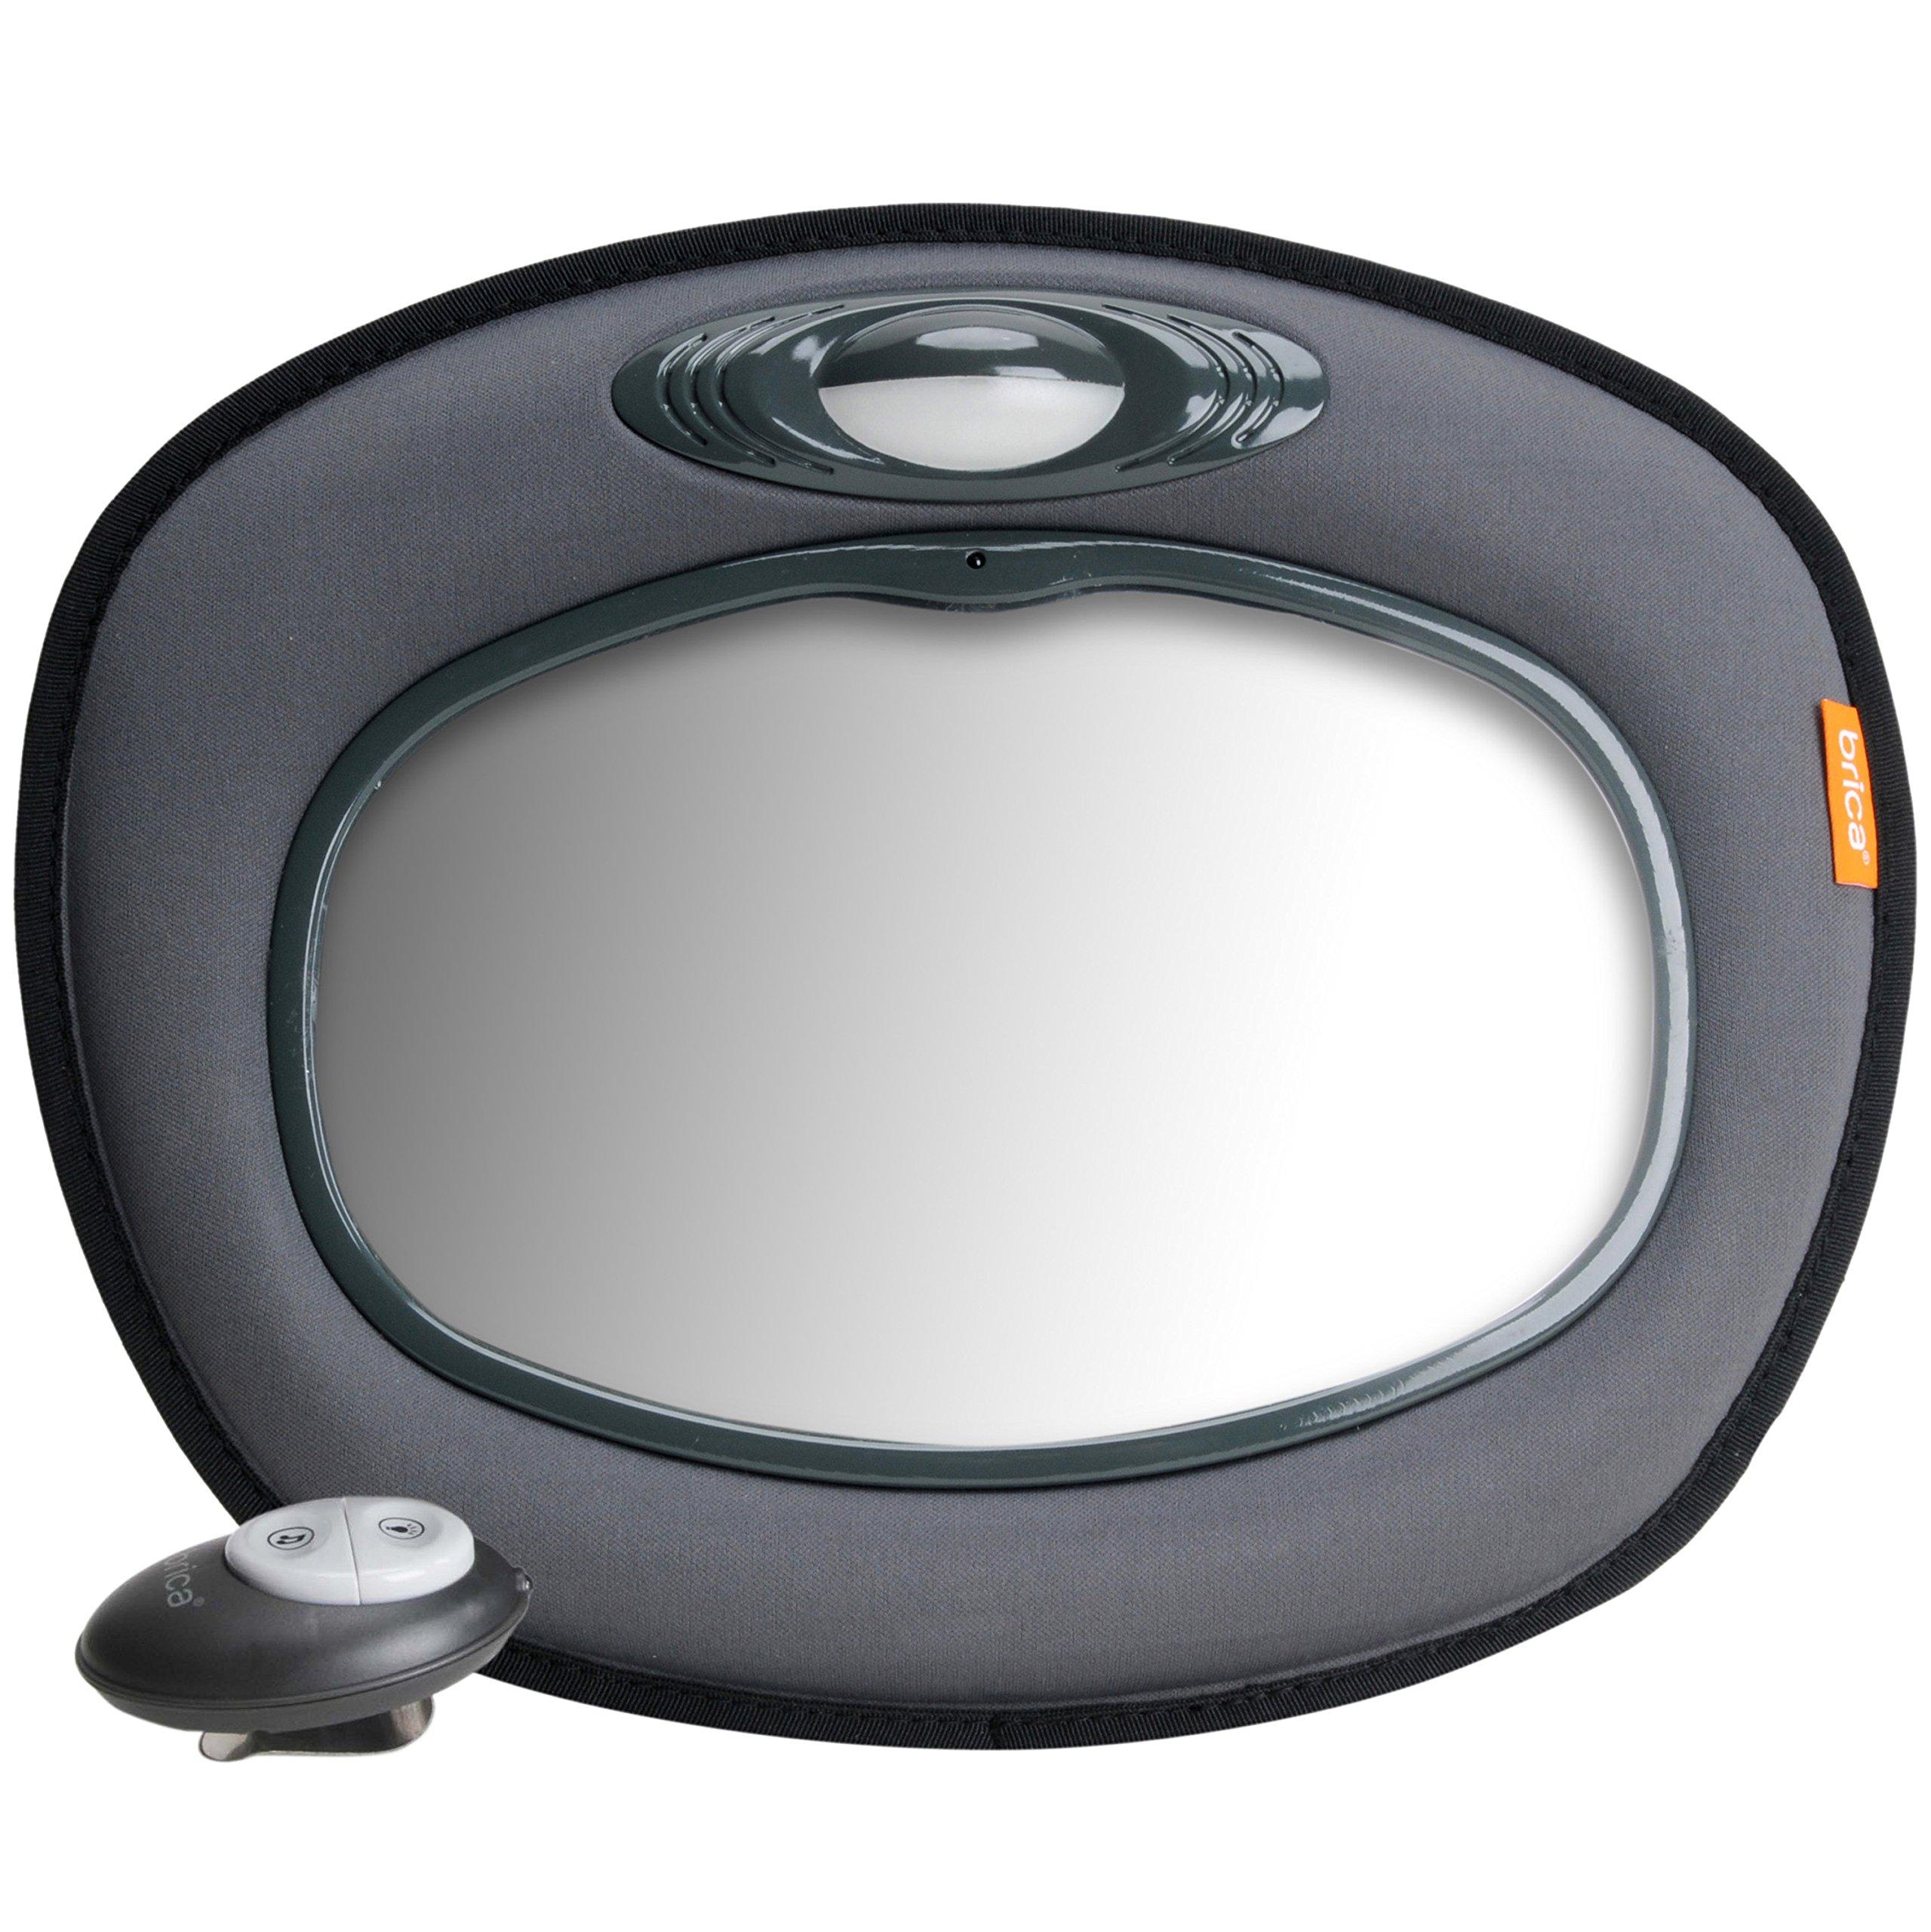 Brica Day and Night Light Musical Auto Mirror, Grey